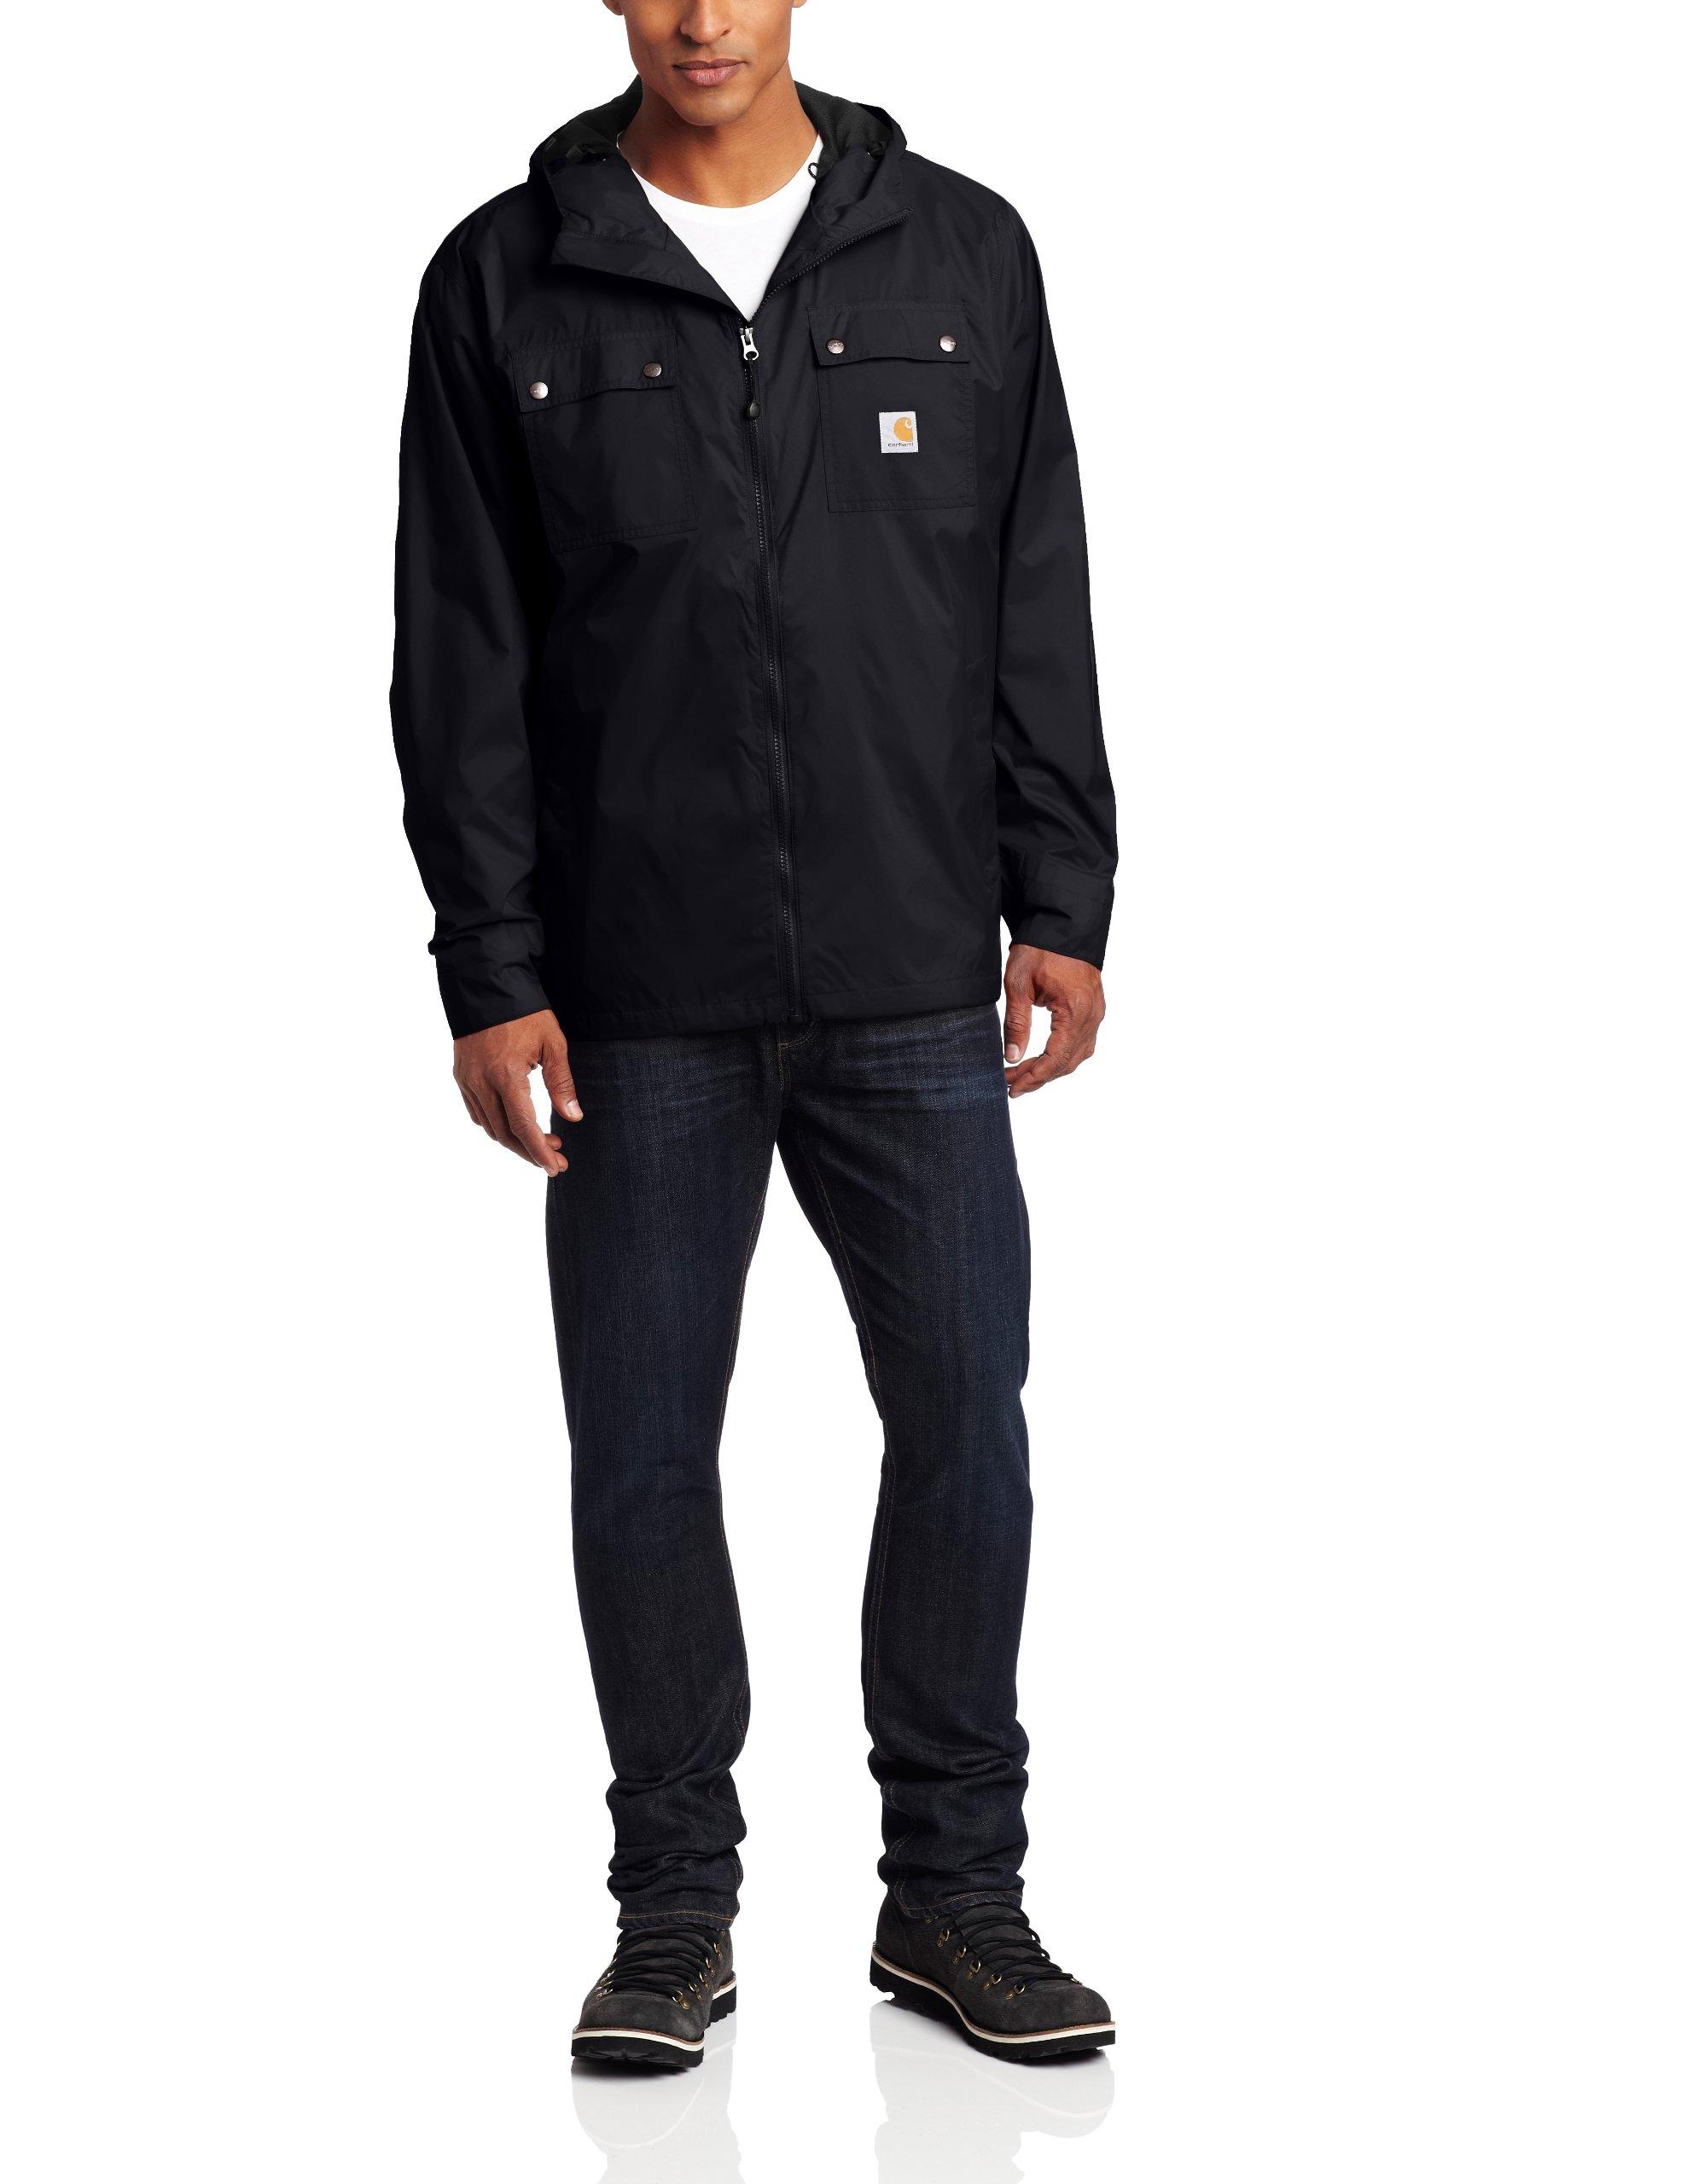 Carhartt Men's Big & Tall Rockford Rain Defender Jacket,Black,XX-Large Tall by Carhartt